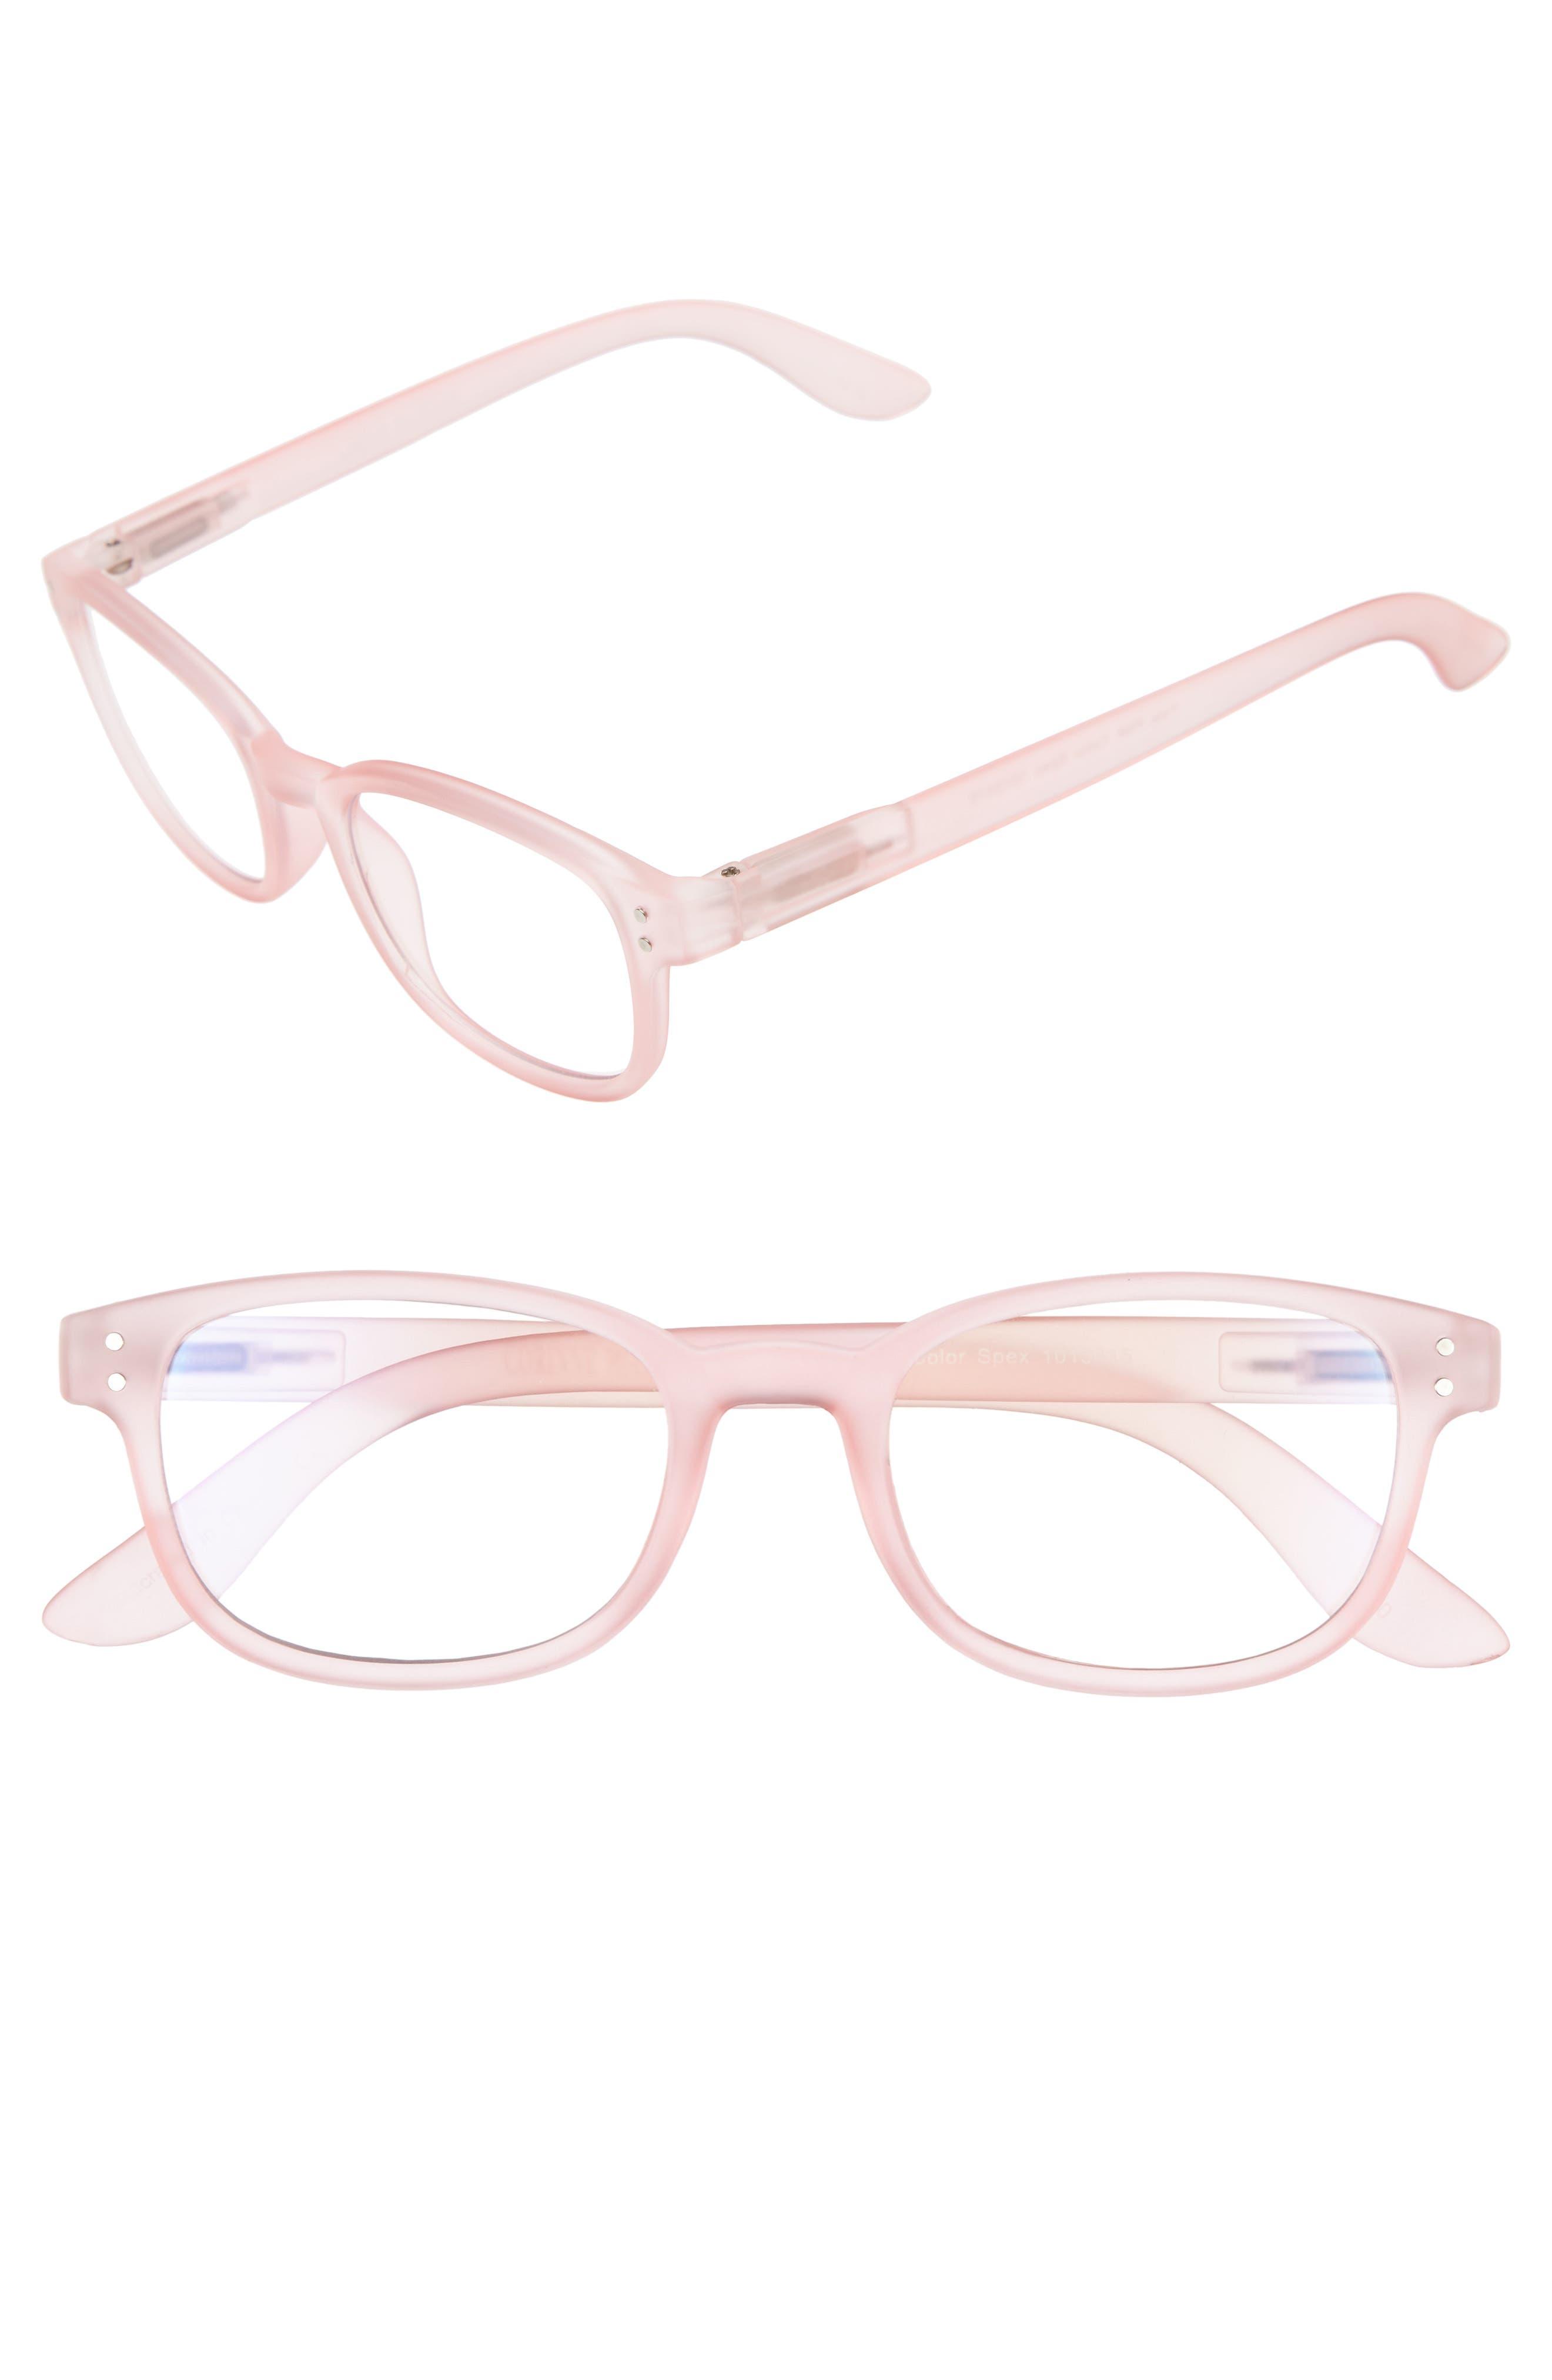 Corinne McCormack ColorSpex® 50mm Blue Light Blocking Reading Glasses